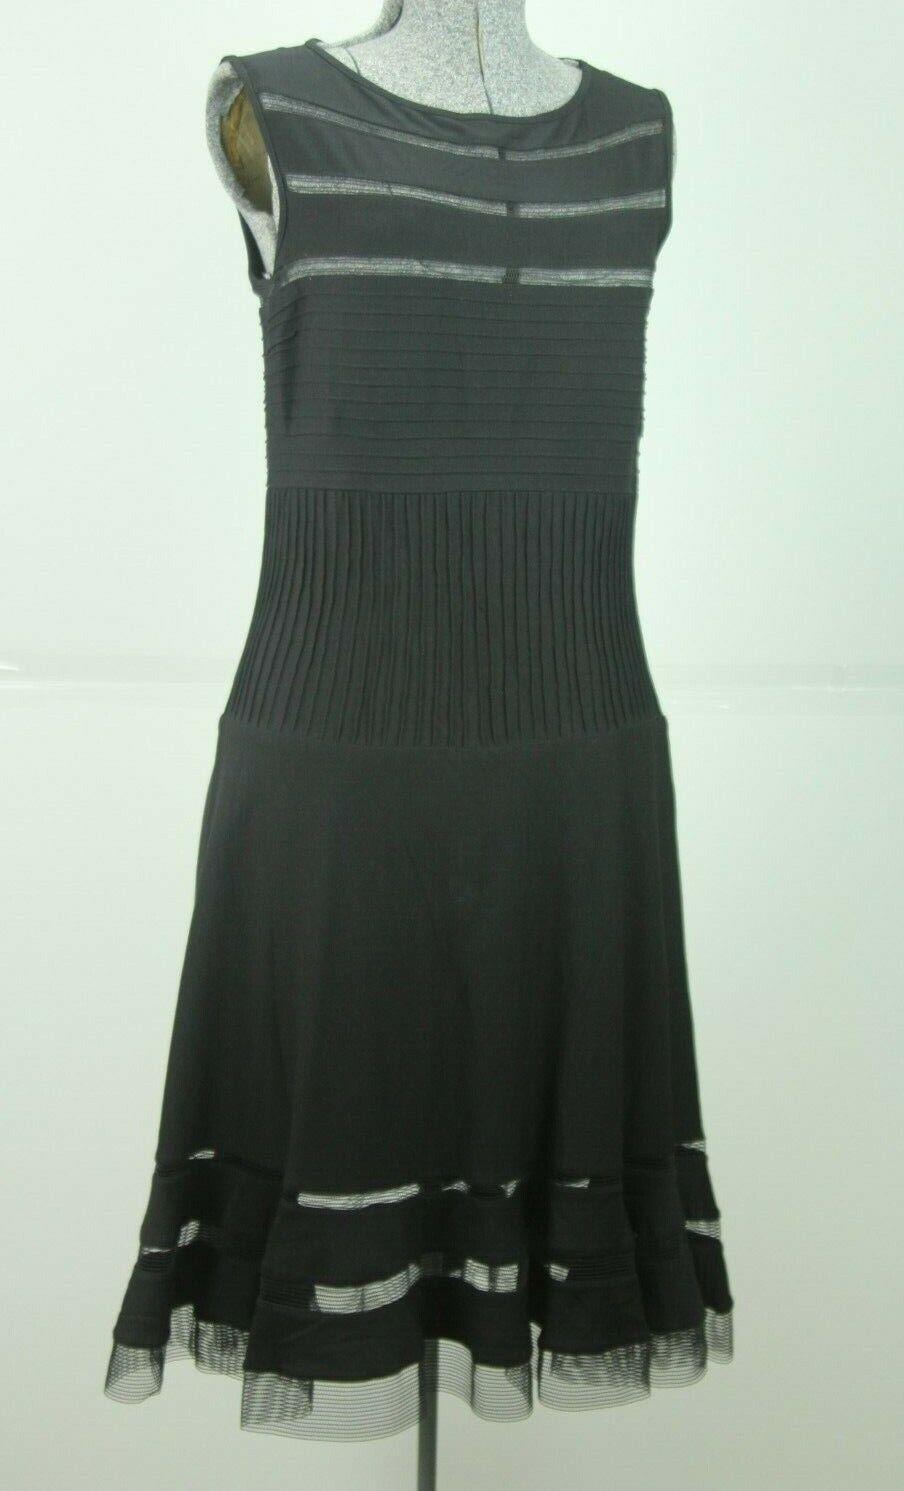 Tadashi Shoji schwarz Cocktail Dress Medium Stretch Jersey Cutouts